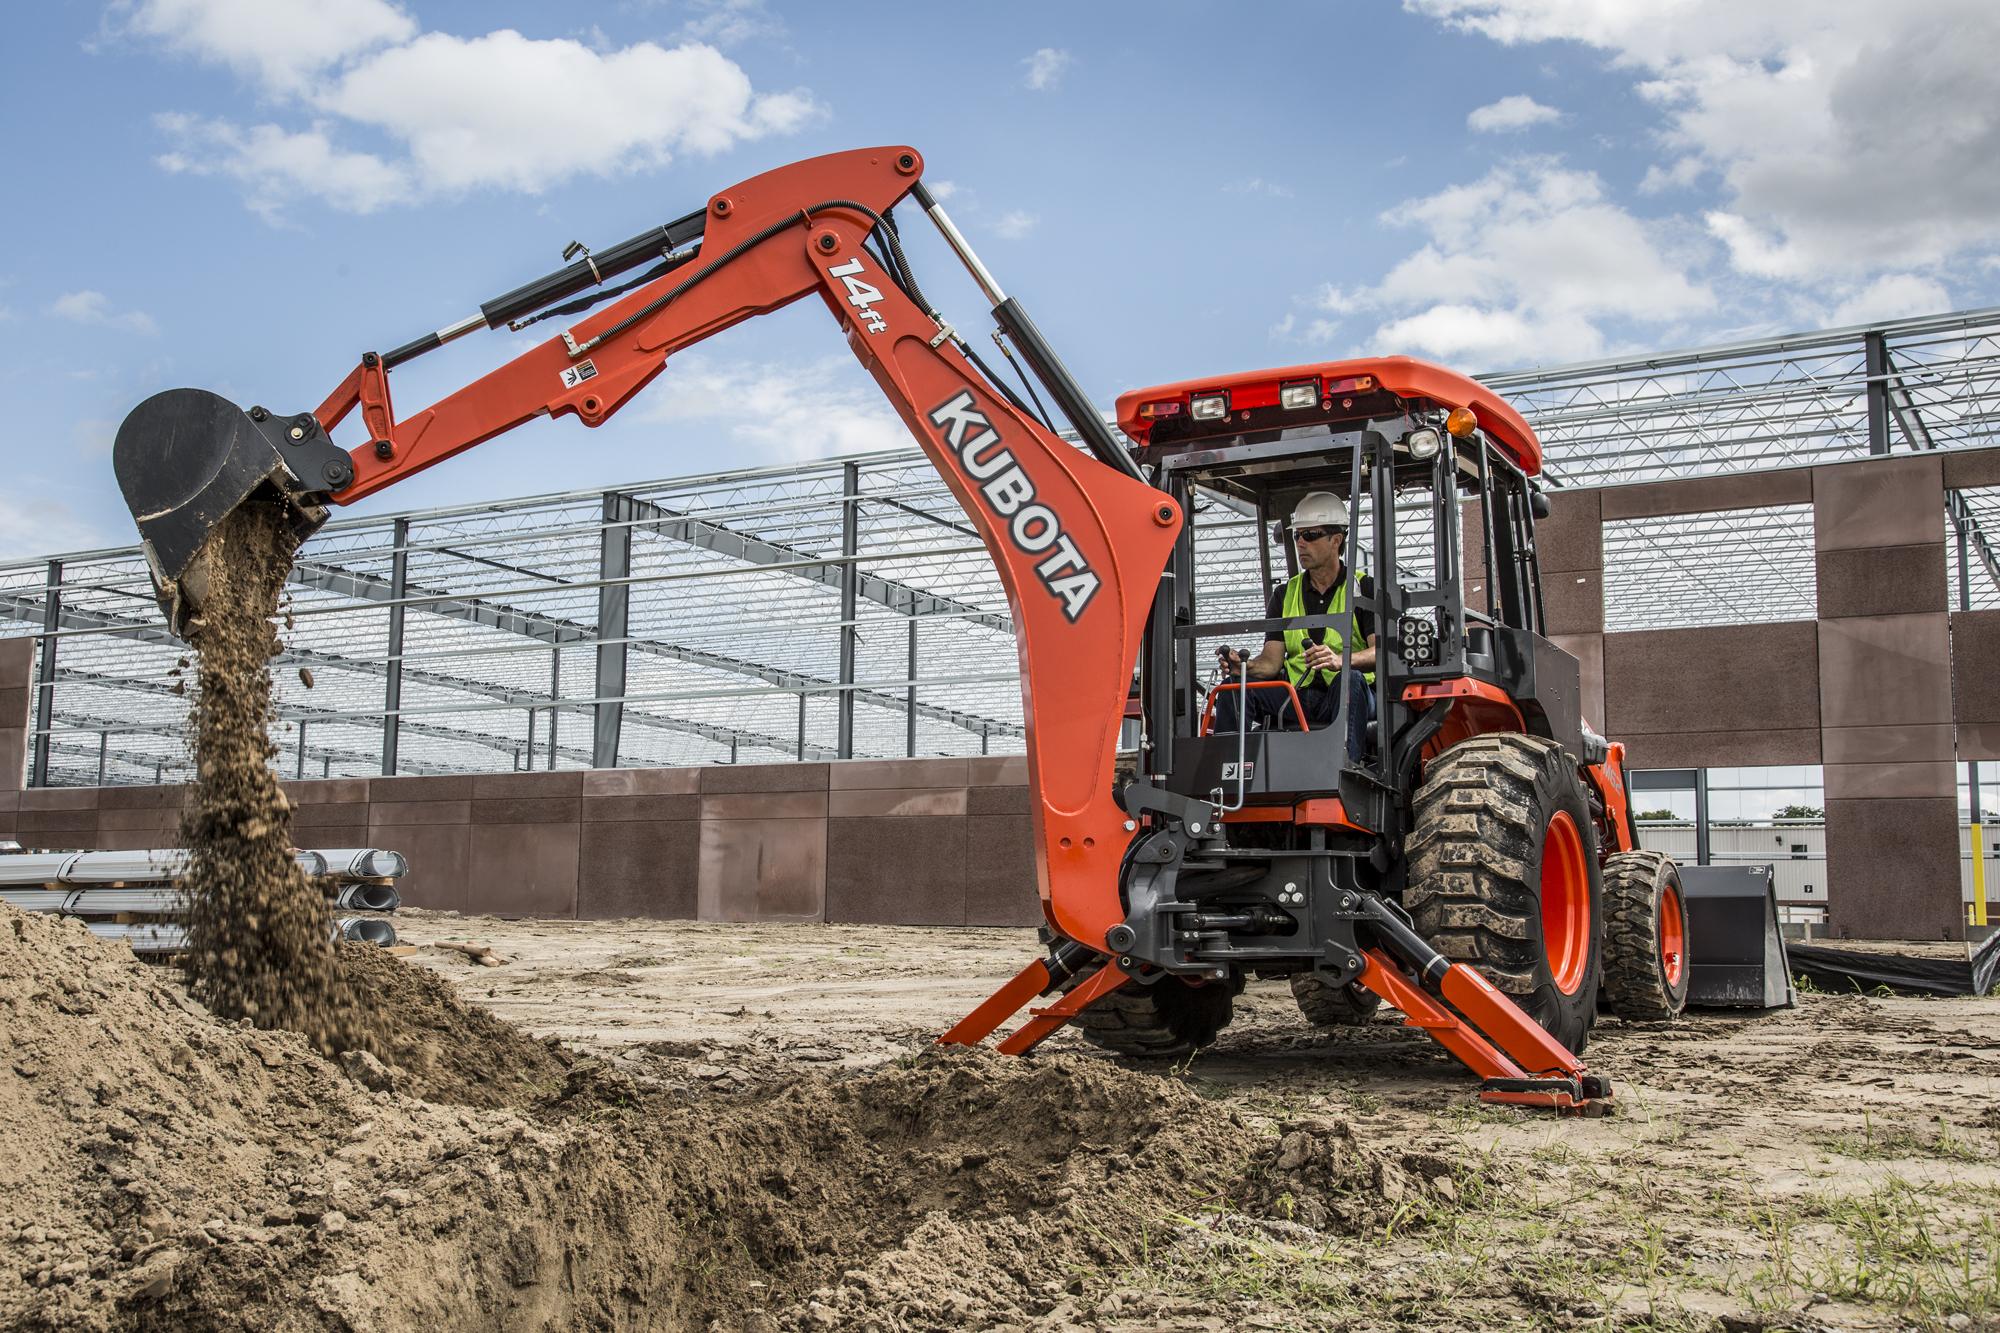 kubota kicks off 2016 two new tractor loader backhoe full size